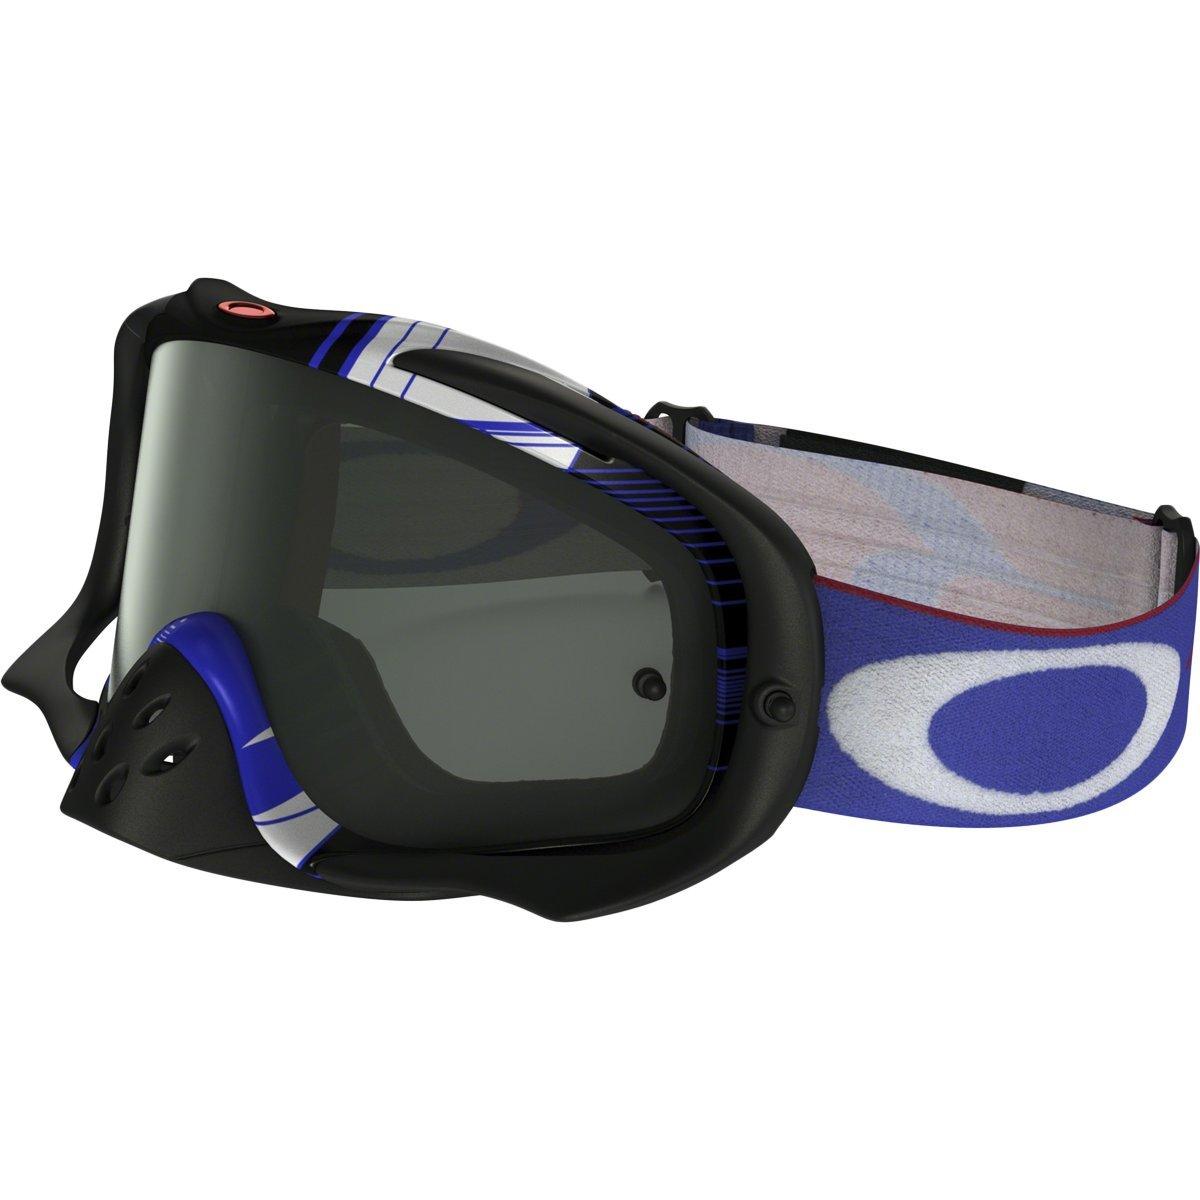 Oakley Crowbar MX Ryan Dungey Adult Off-Road Motorcycle Goggles Eyewear - Block Pass RWB/Dark Grey/One Size Fits All